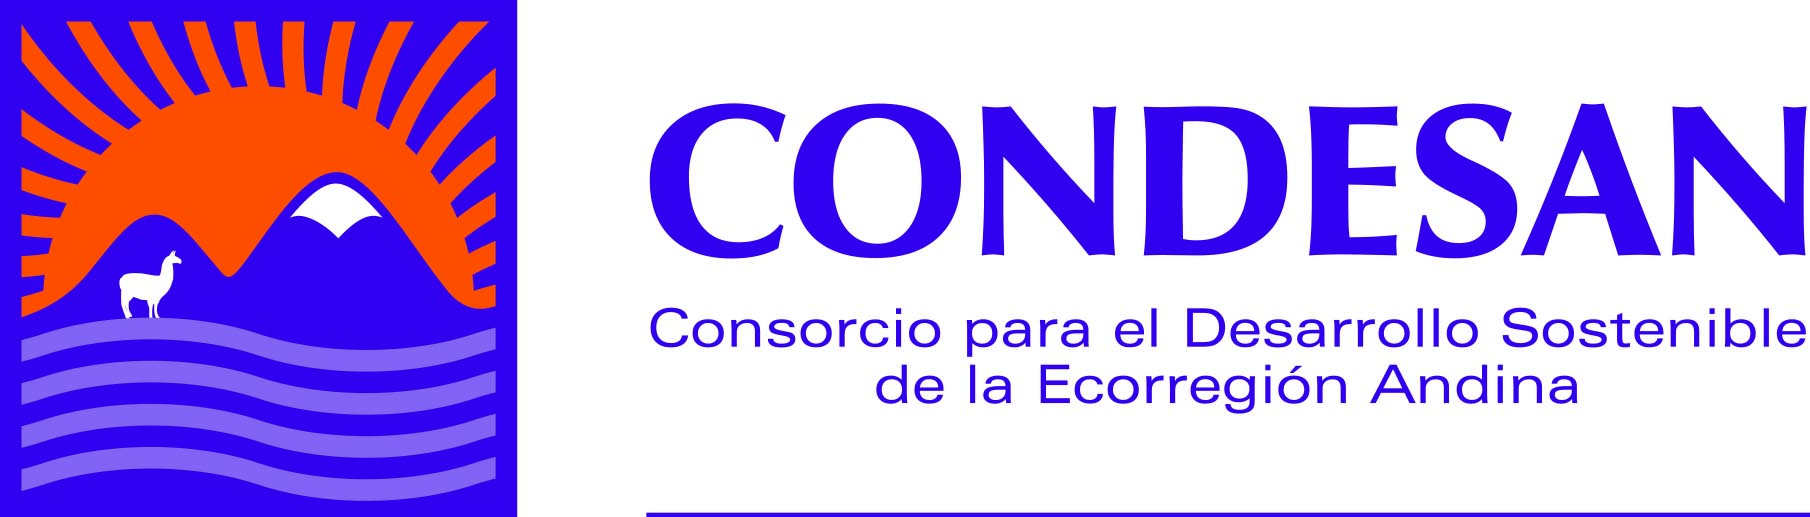 LOGO CONDESAN